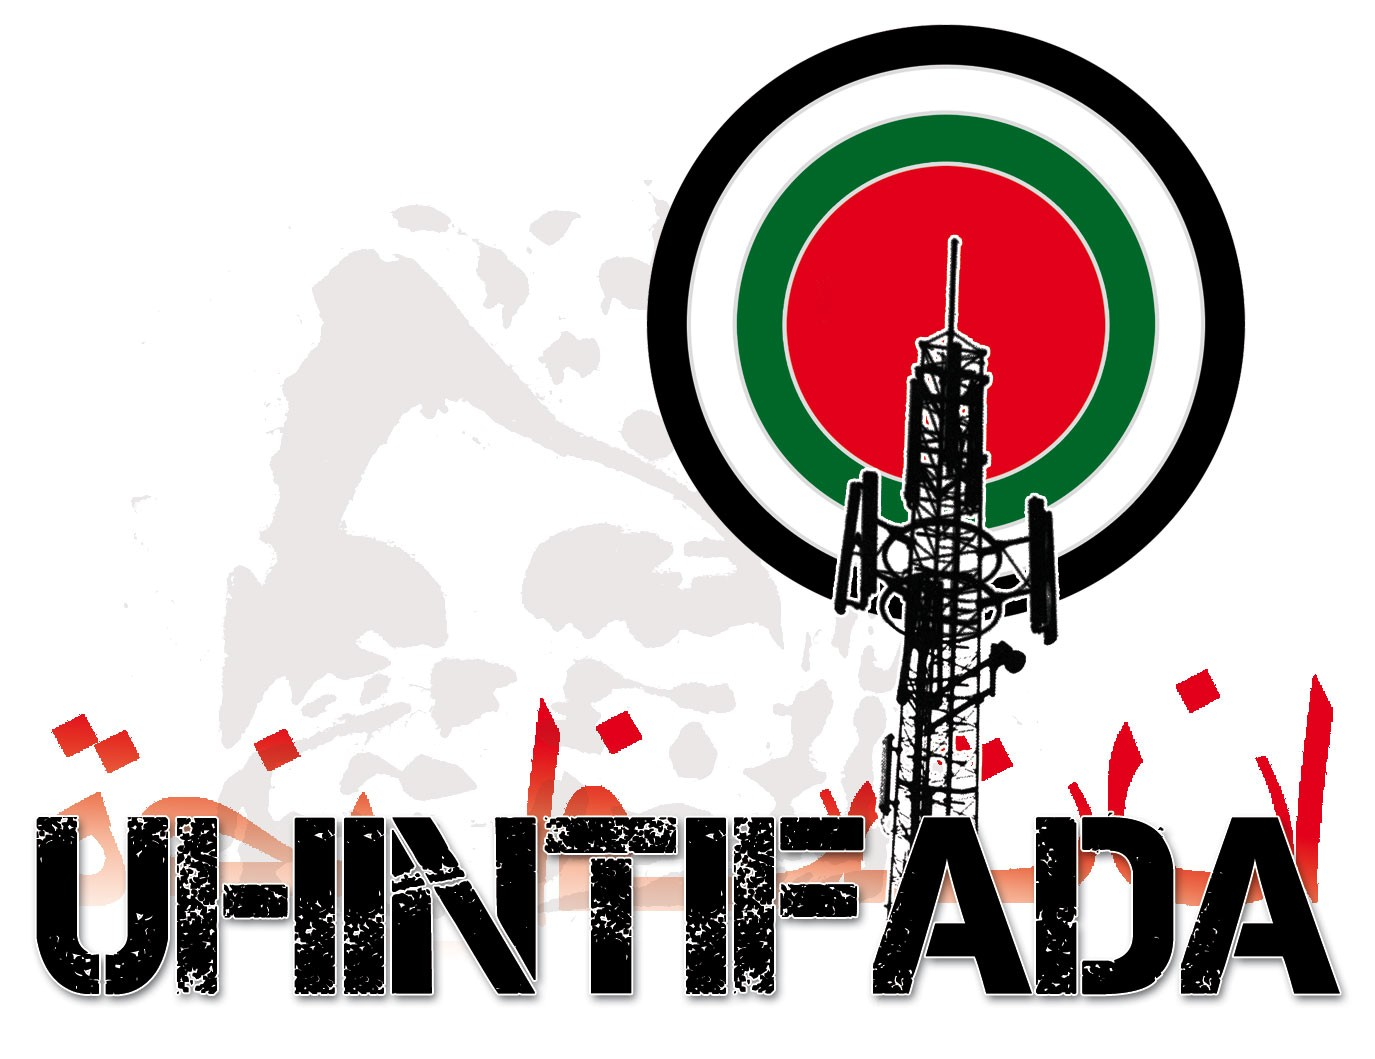 UHINTIFADA  en  Hala  Bedi  Irratia